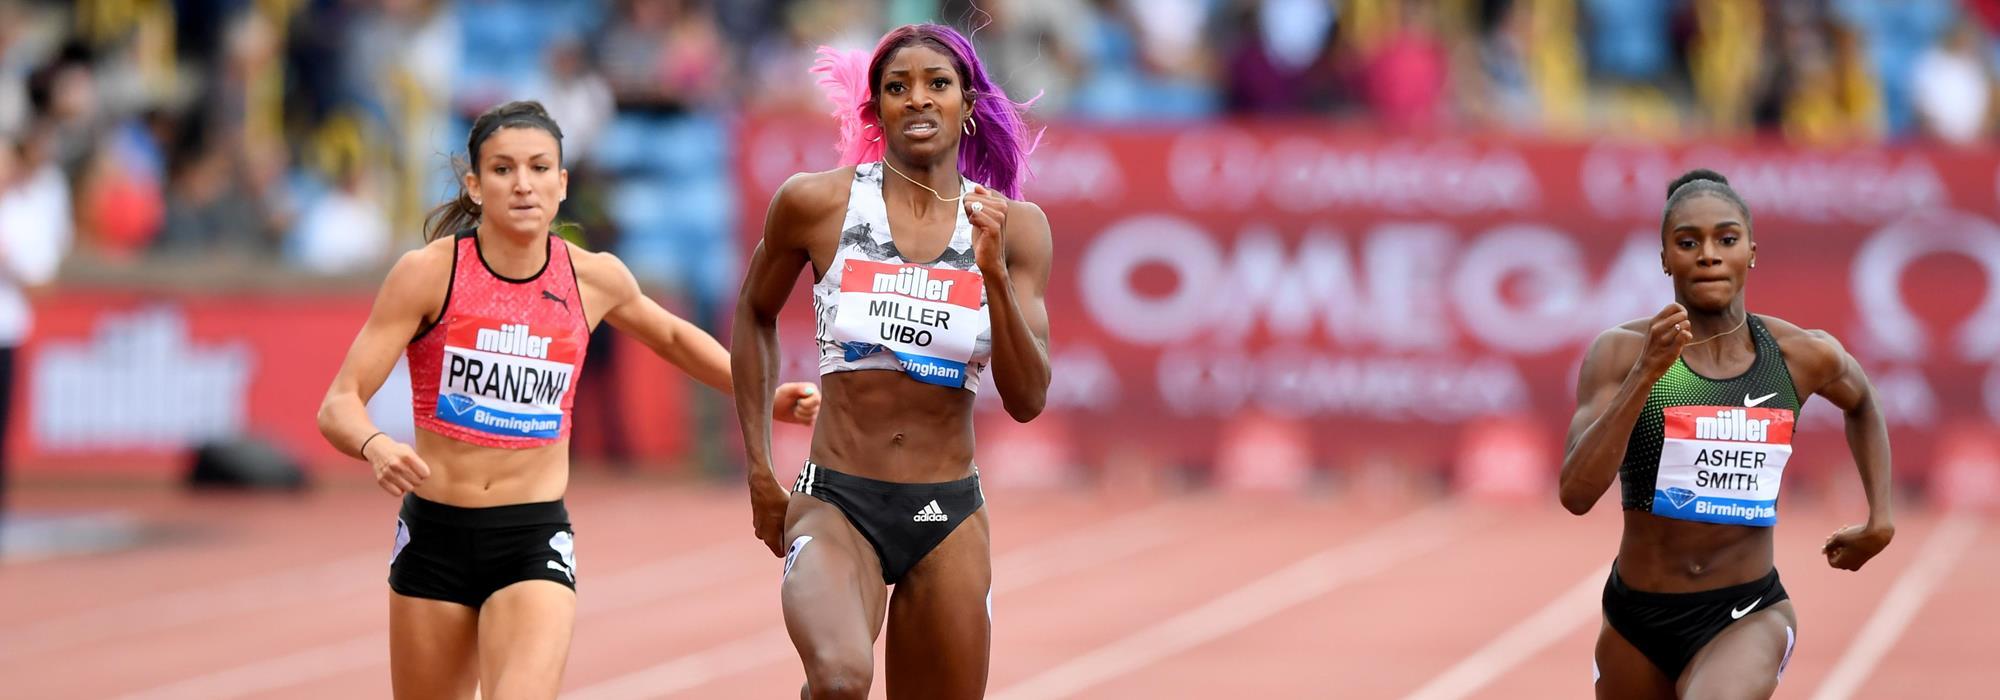 Shaunae Miller-Uibo wins the Birmingham 200m showdown (Jiro Mochizuki)